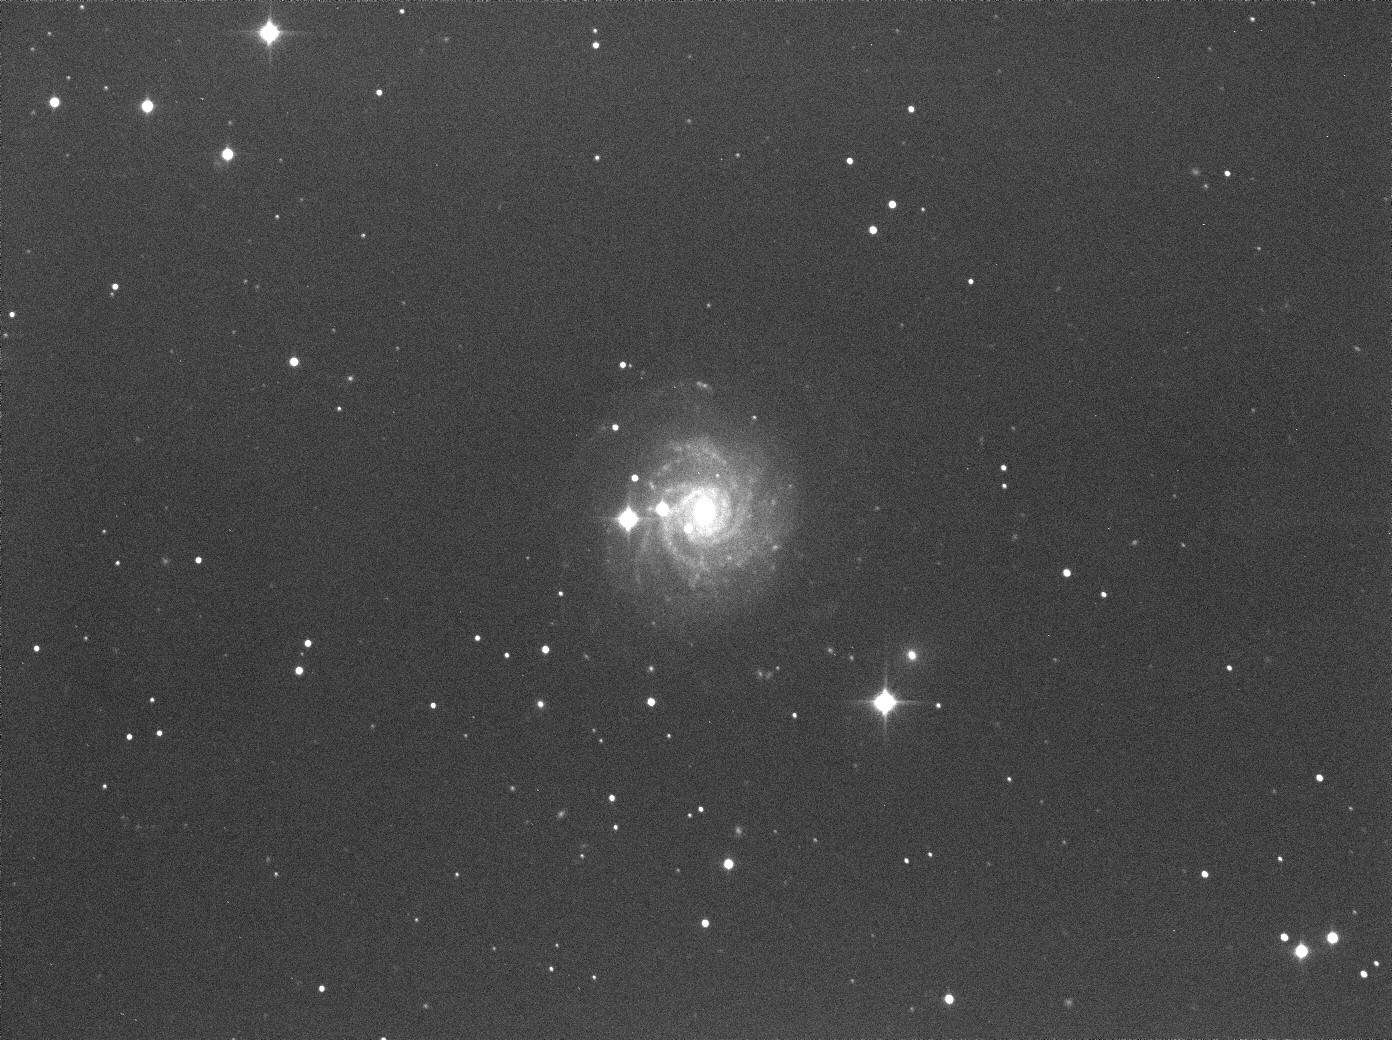 NGC3344 12x60s B1 LPS P2